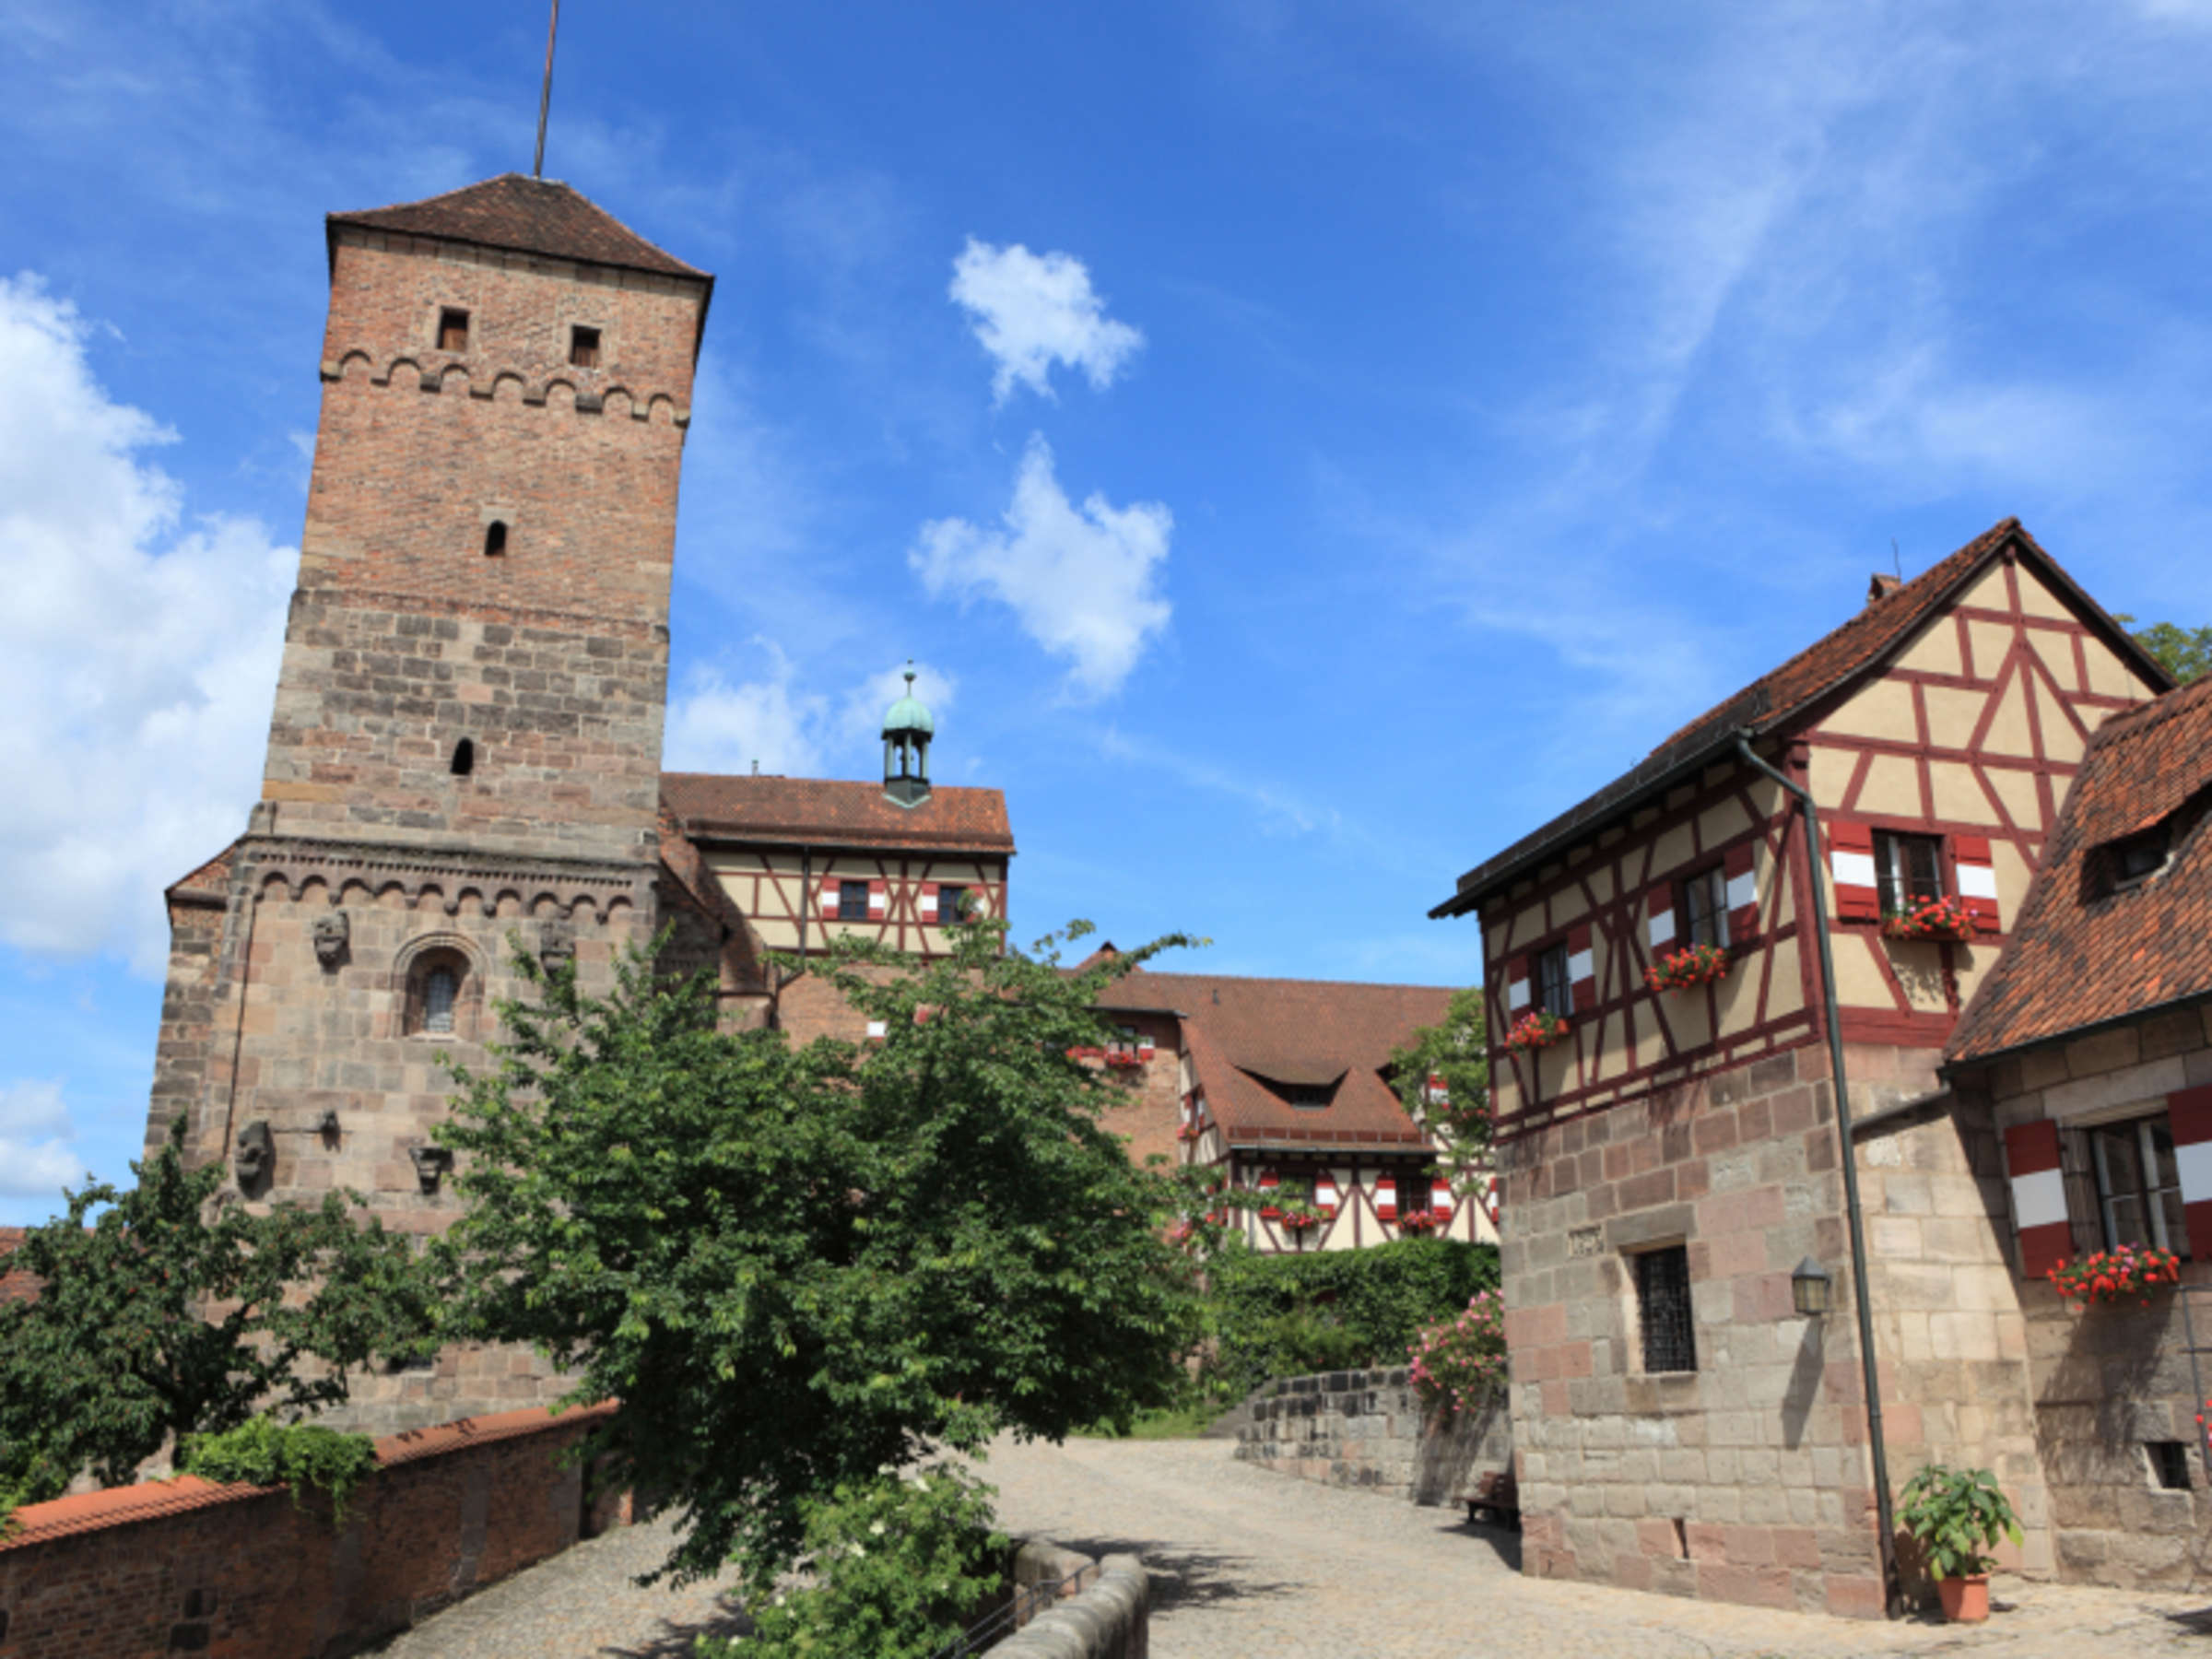 Freundschaften finden & Leute kennenlernen in Nürnberg